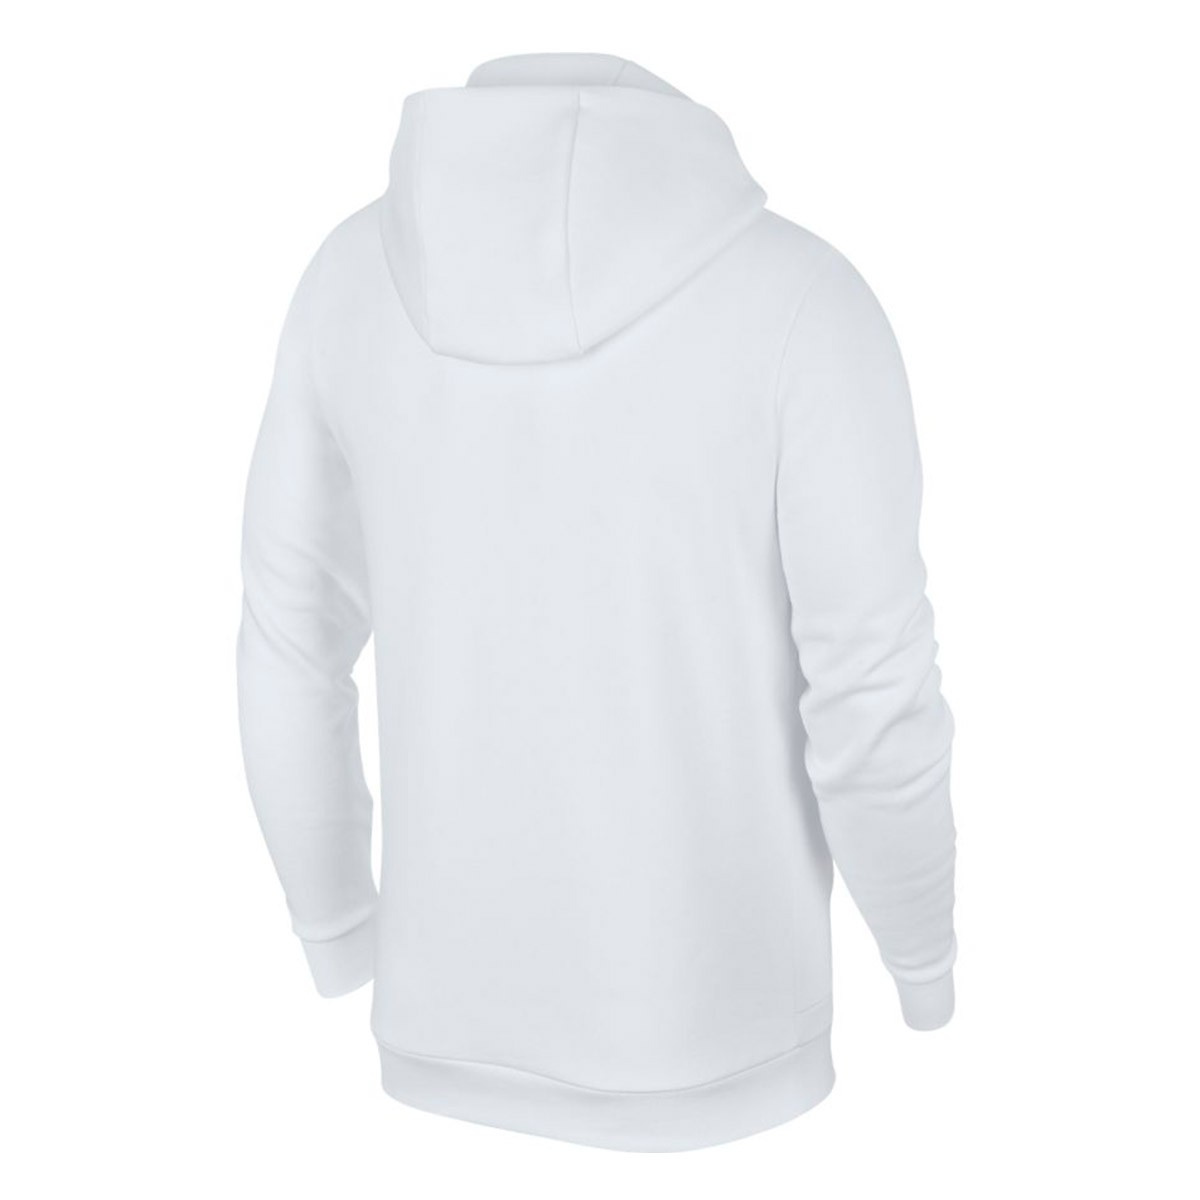 1477010e0db ... Sudadera Jordan x PSG Jumpman PO White-Black. CATEGORY. Lifestyle ·  Clothes